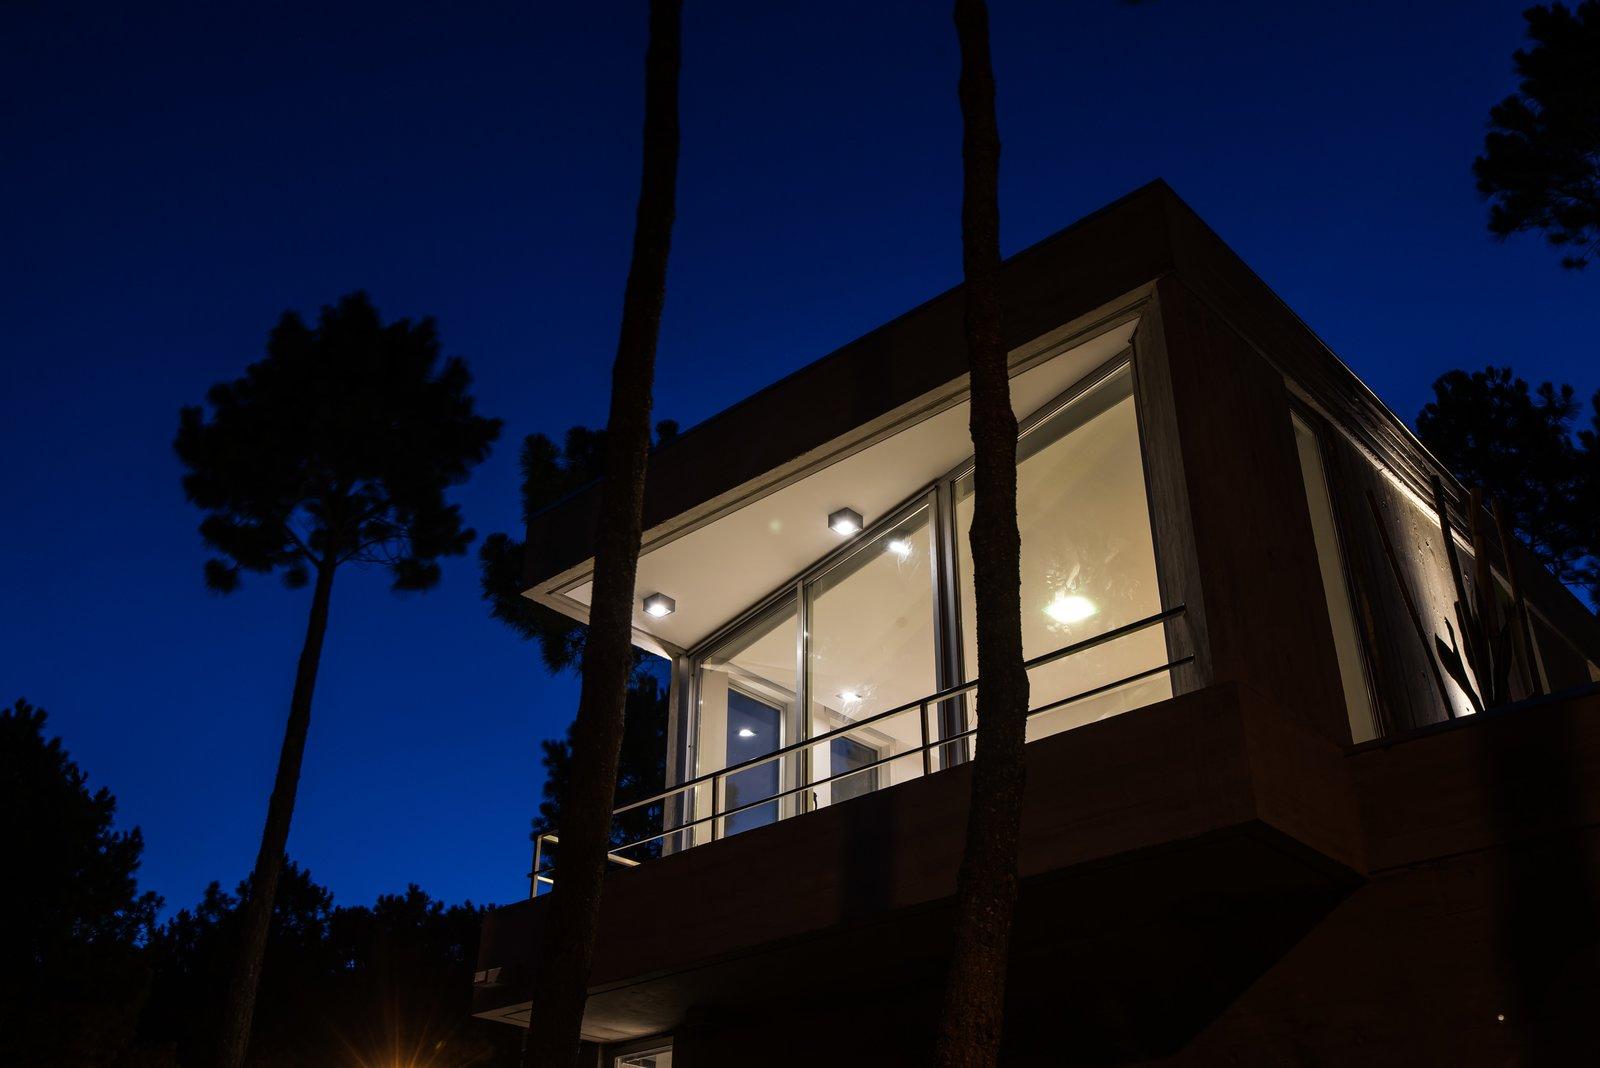 Tagged: Outdoor, Trees, Hanging Lighting, and Front Yard.  Casa Batin by Estudio Galera